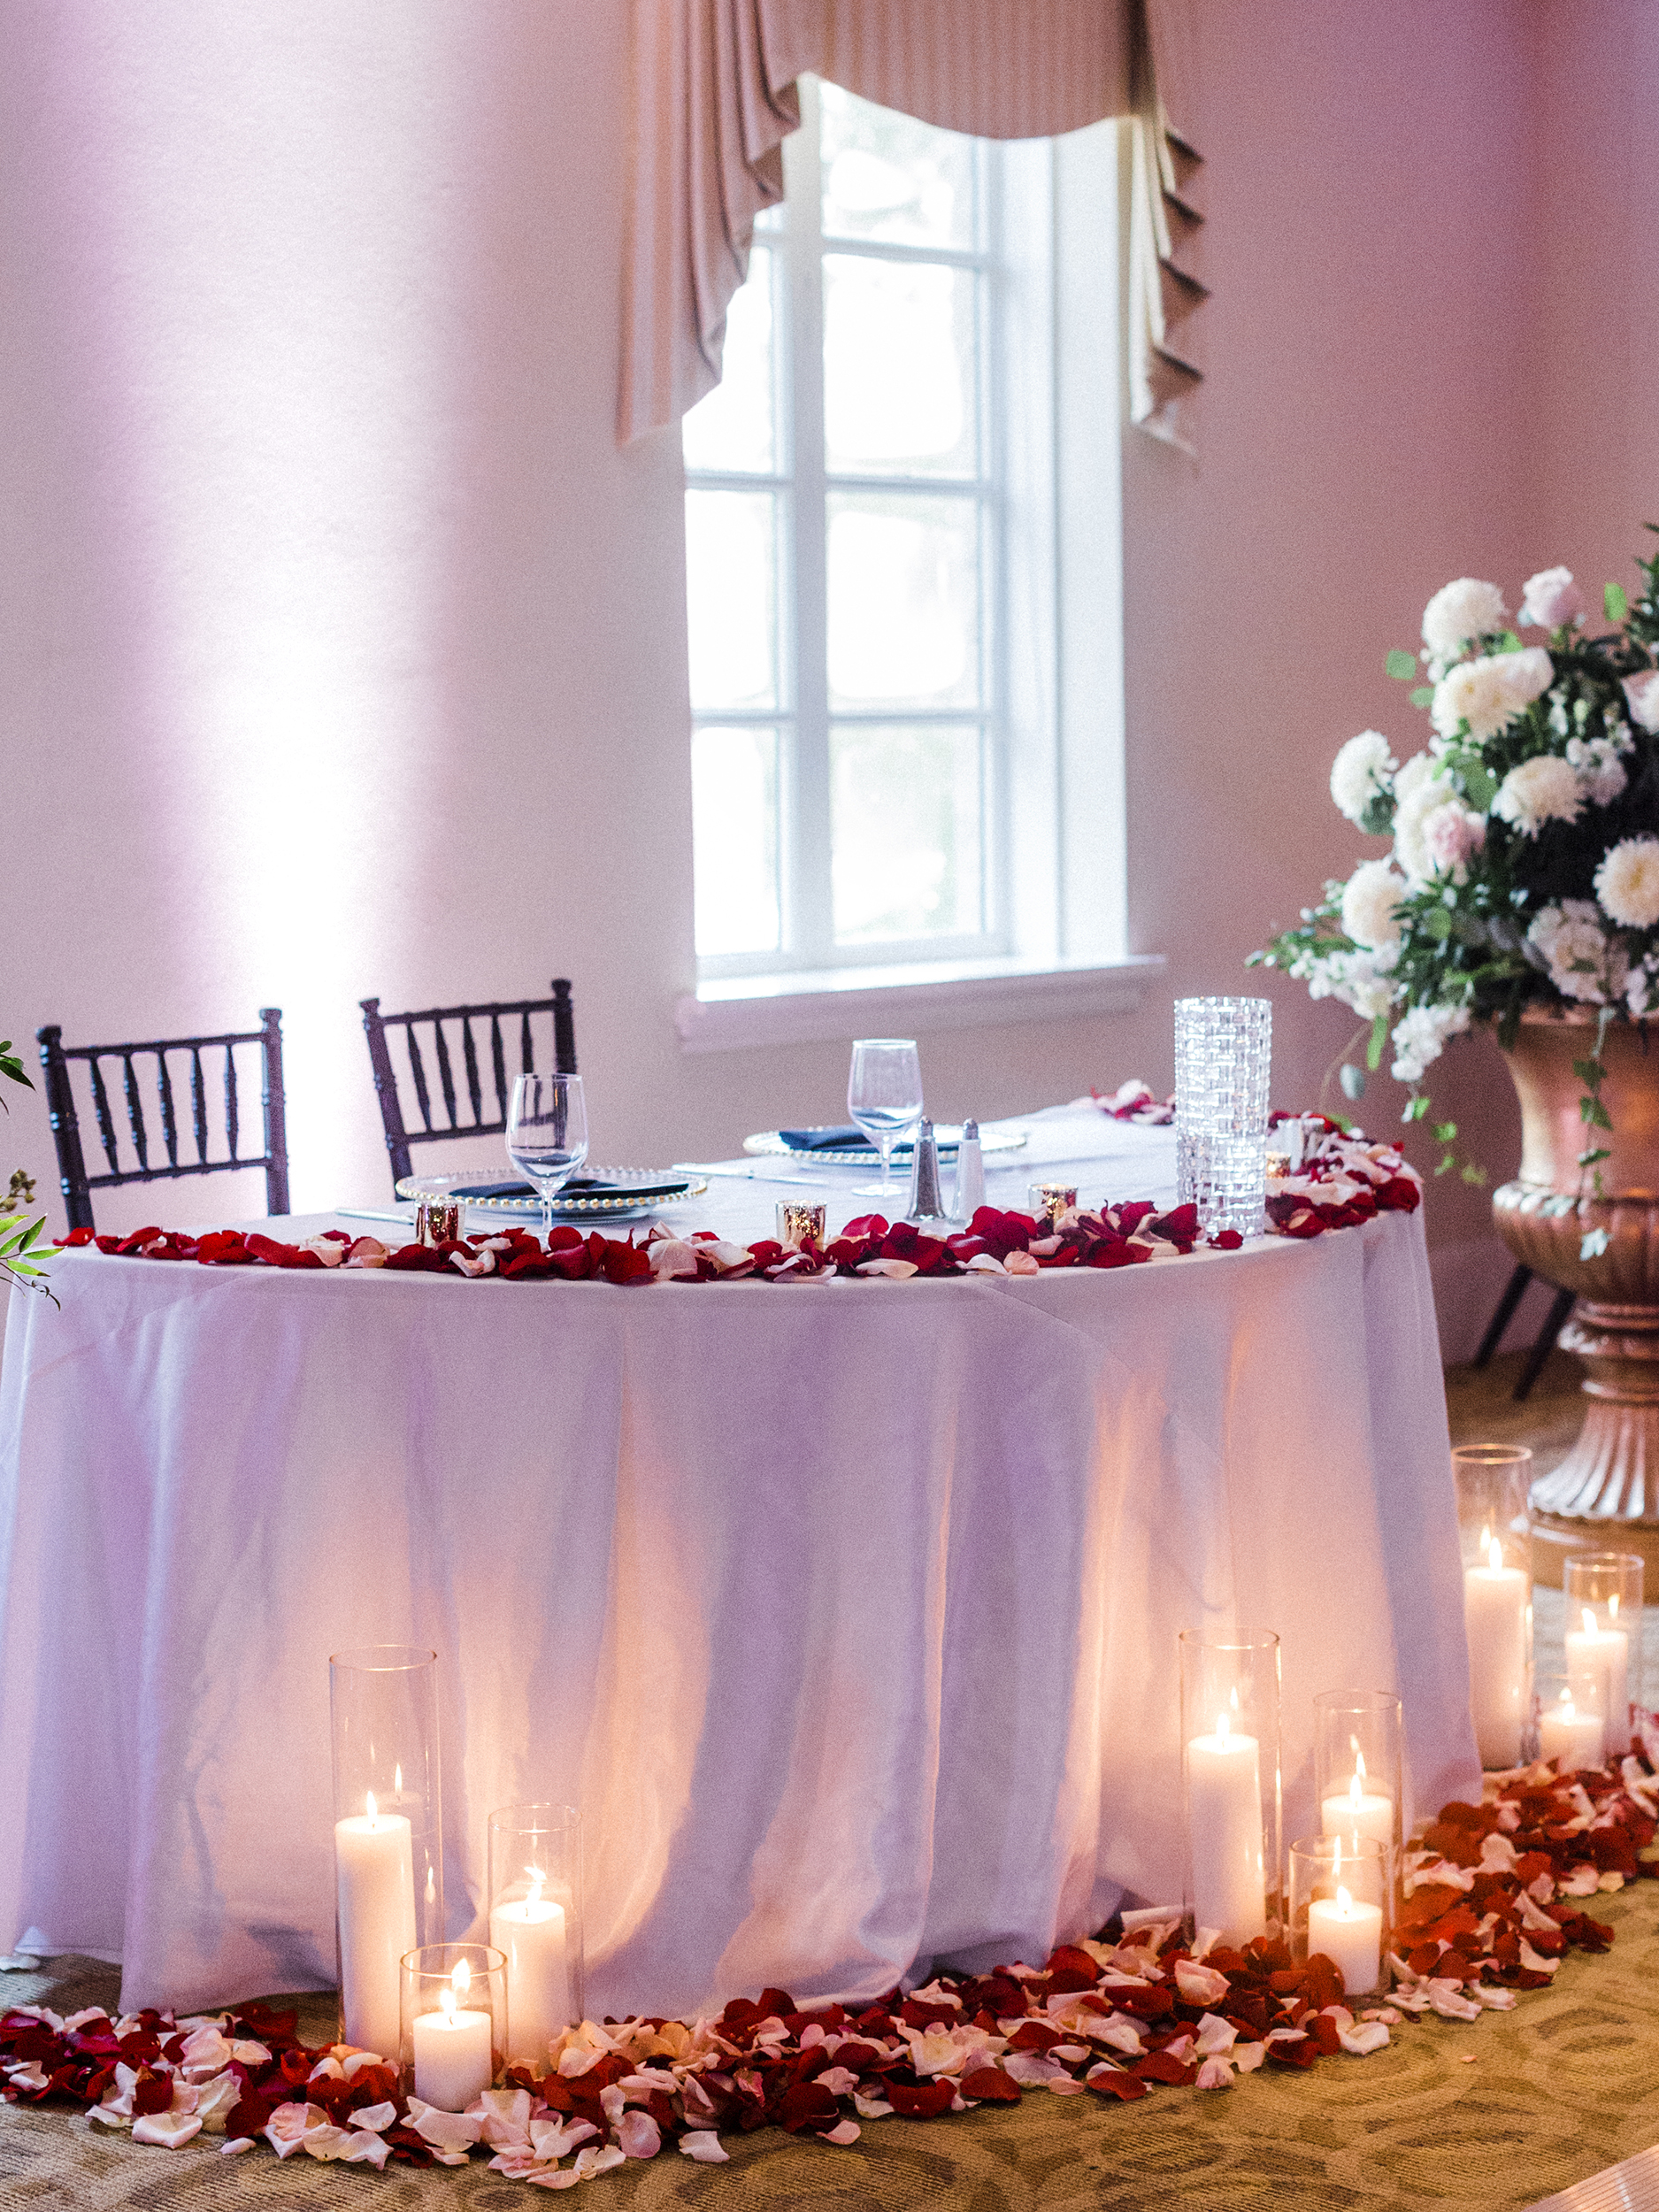 Lisa Silva Photography- Jacksonville, Florida Fine Art Film Wedding Photography Epping Forrest Yacht Club 53.jpg